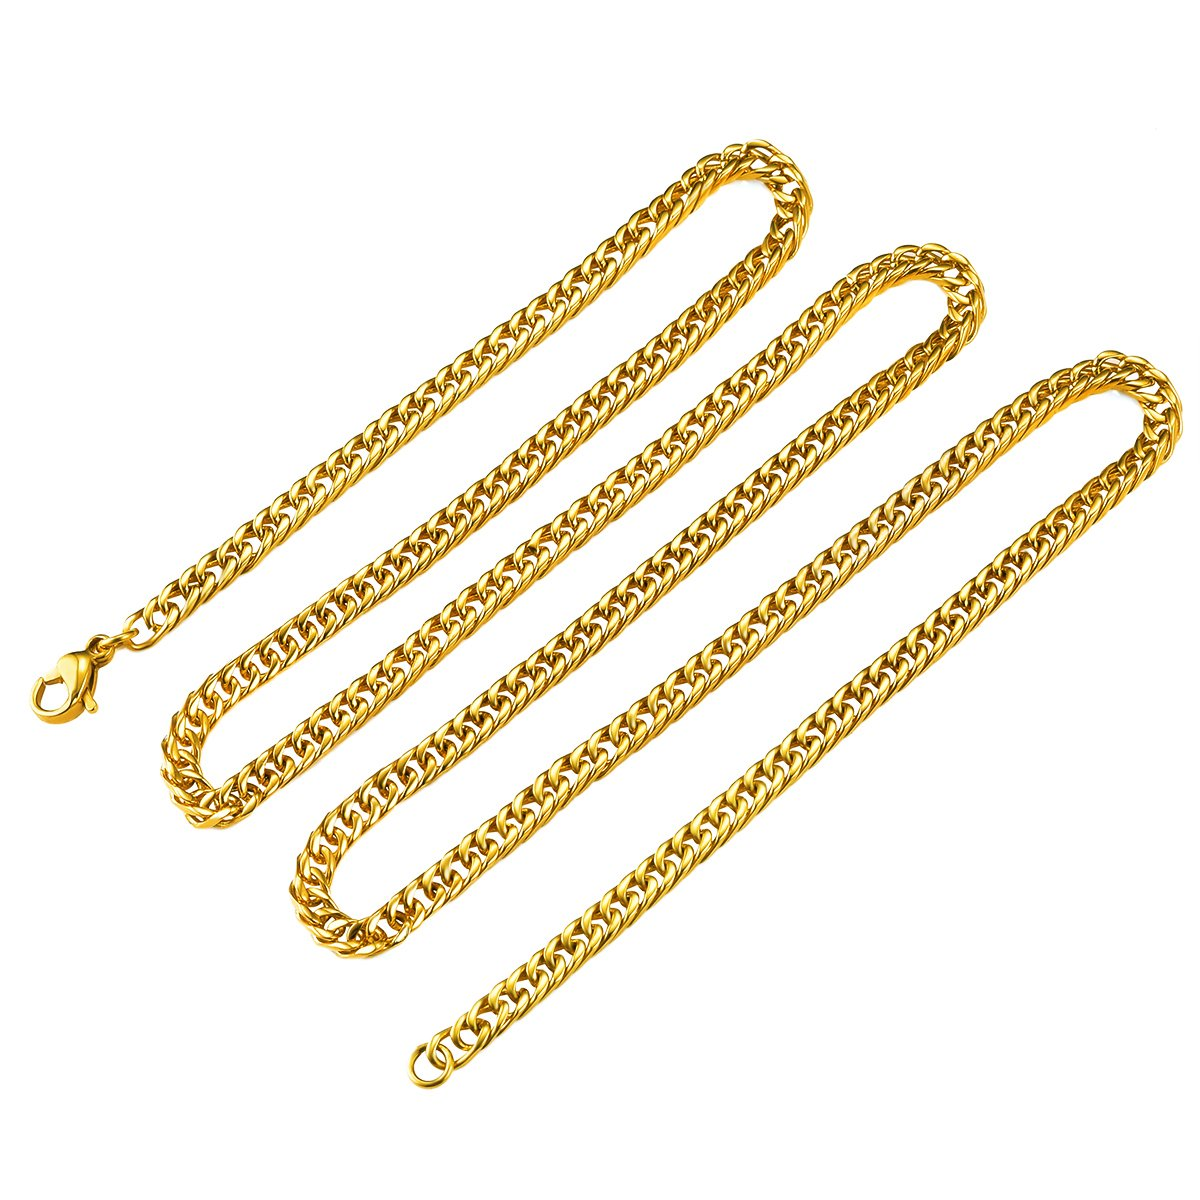 Smart Ladies Gold Silver Plated Solid Band Ankle Bracelet Anklets